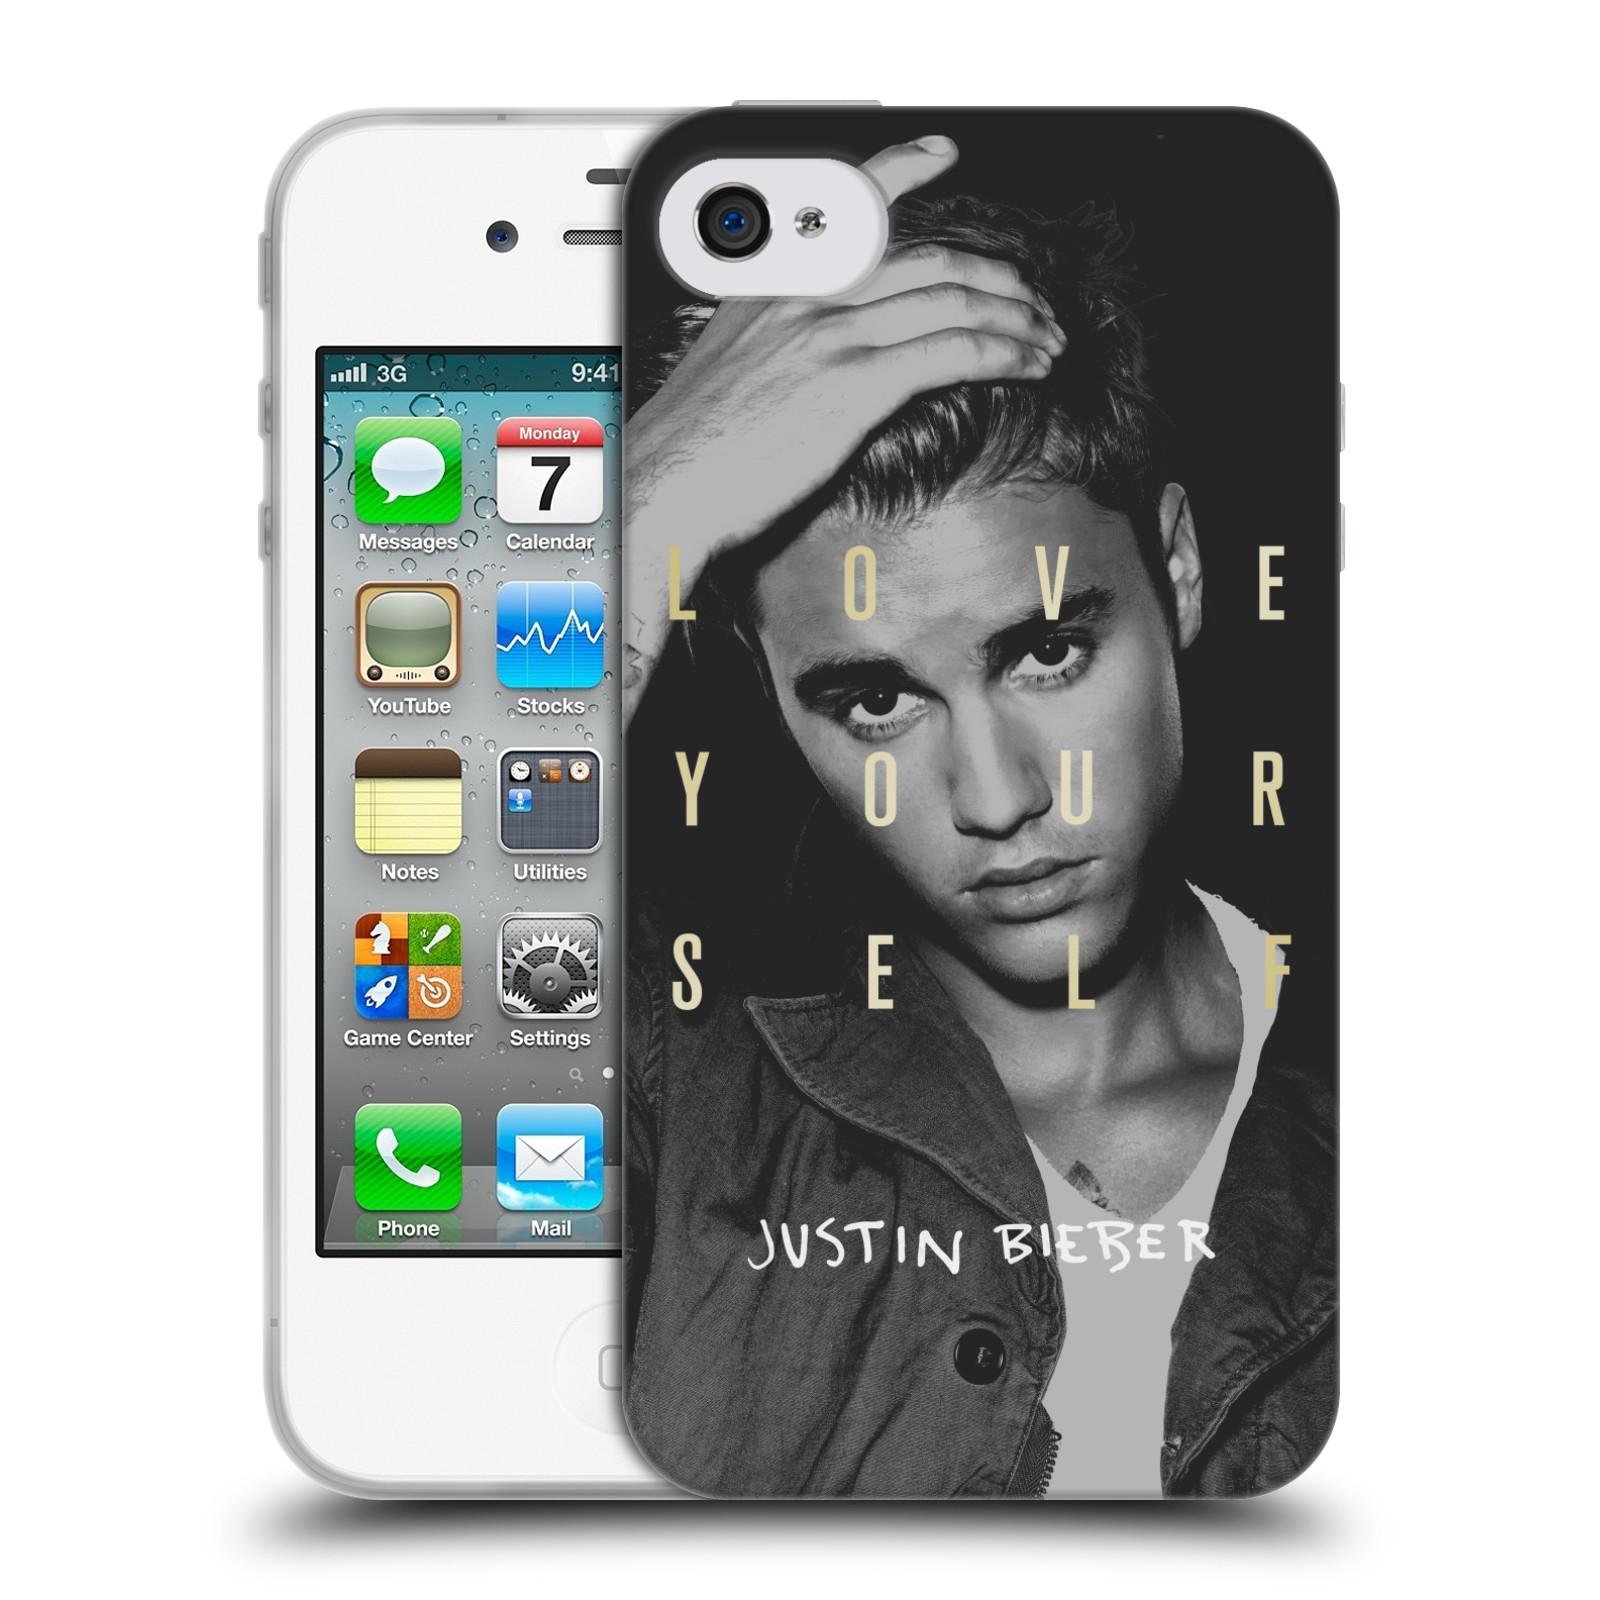 HEAD CASE silikonový obal na mobil Apple Iphone 4 / 4S originální potisk Justin Bieber foto text